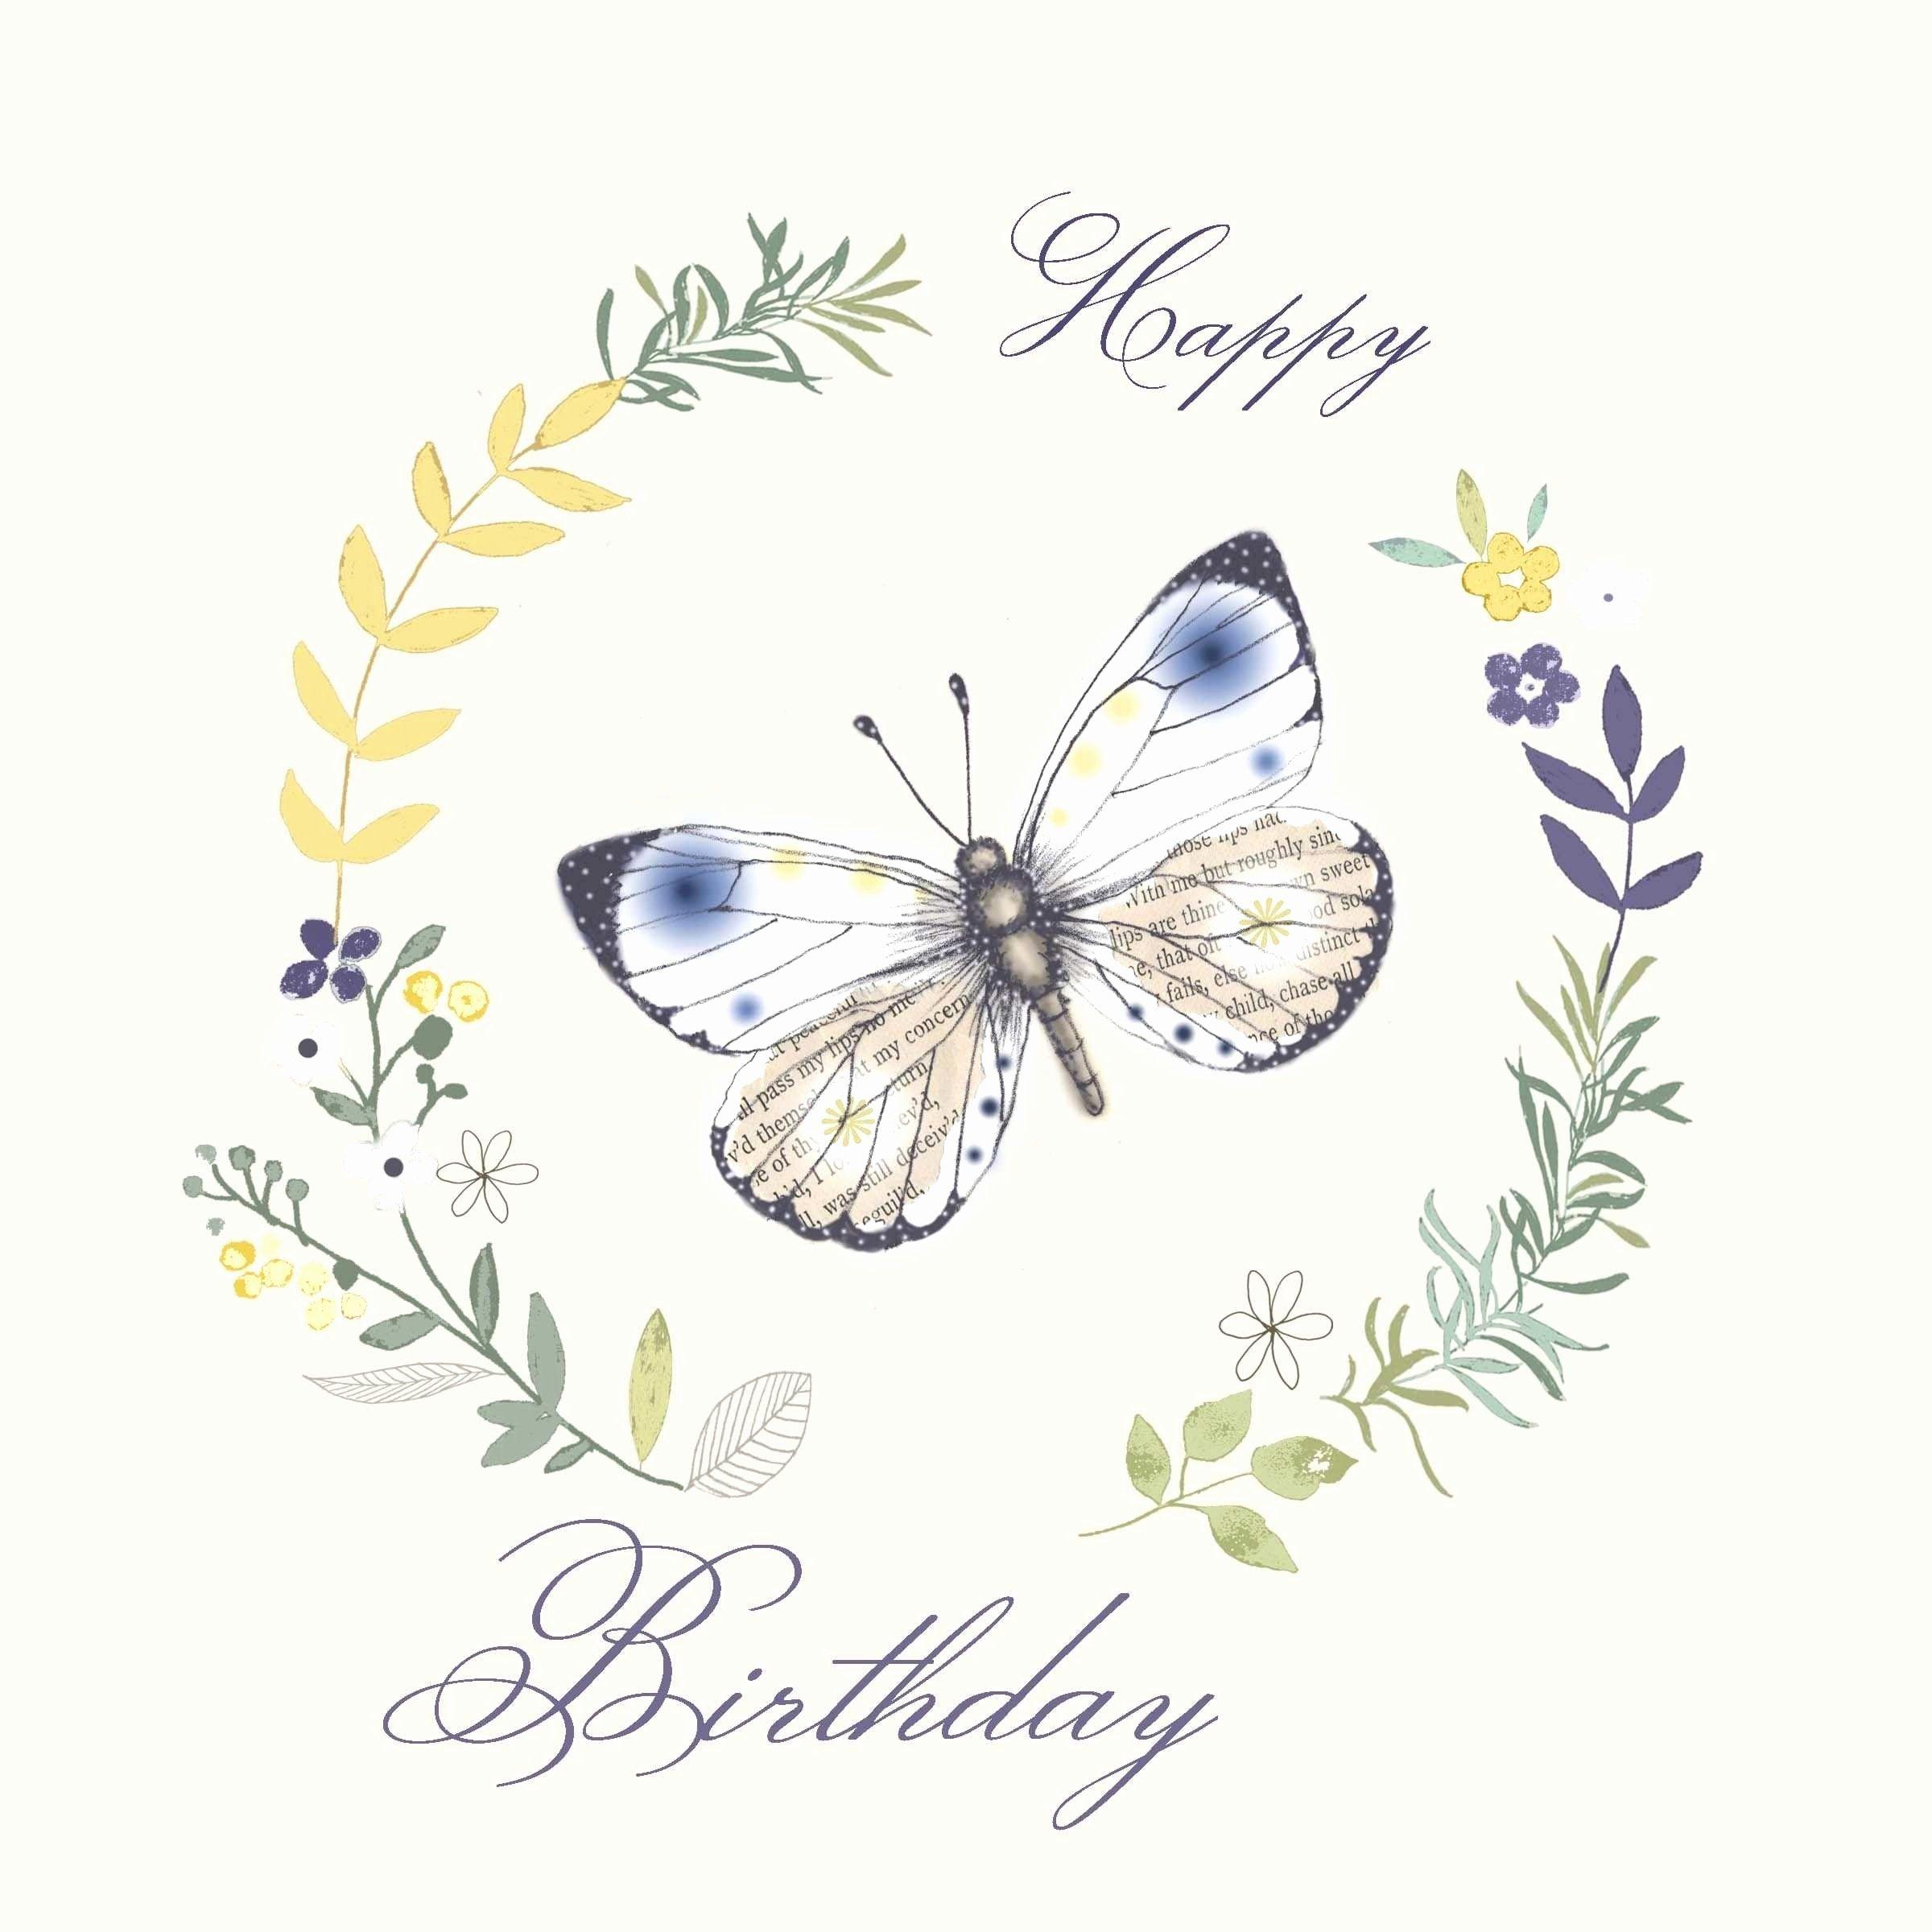 Free Sympathy Ecard in 2020 Happy birthday messages